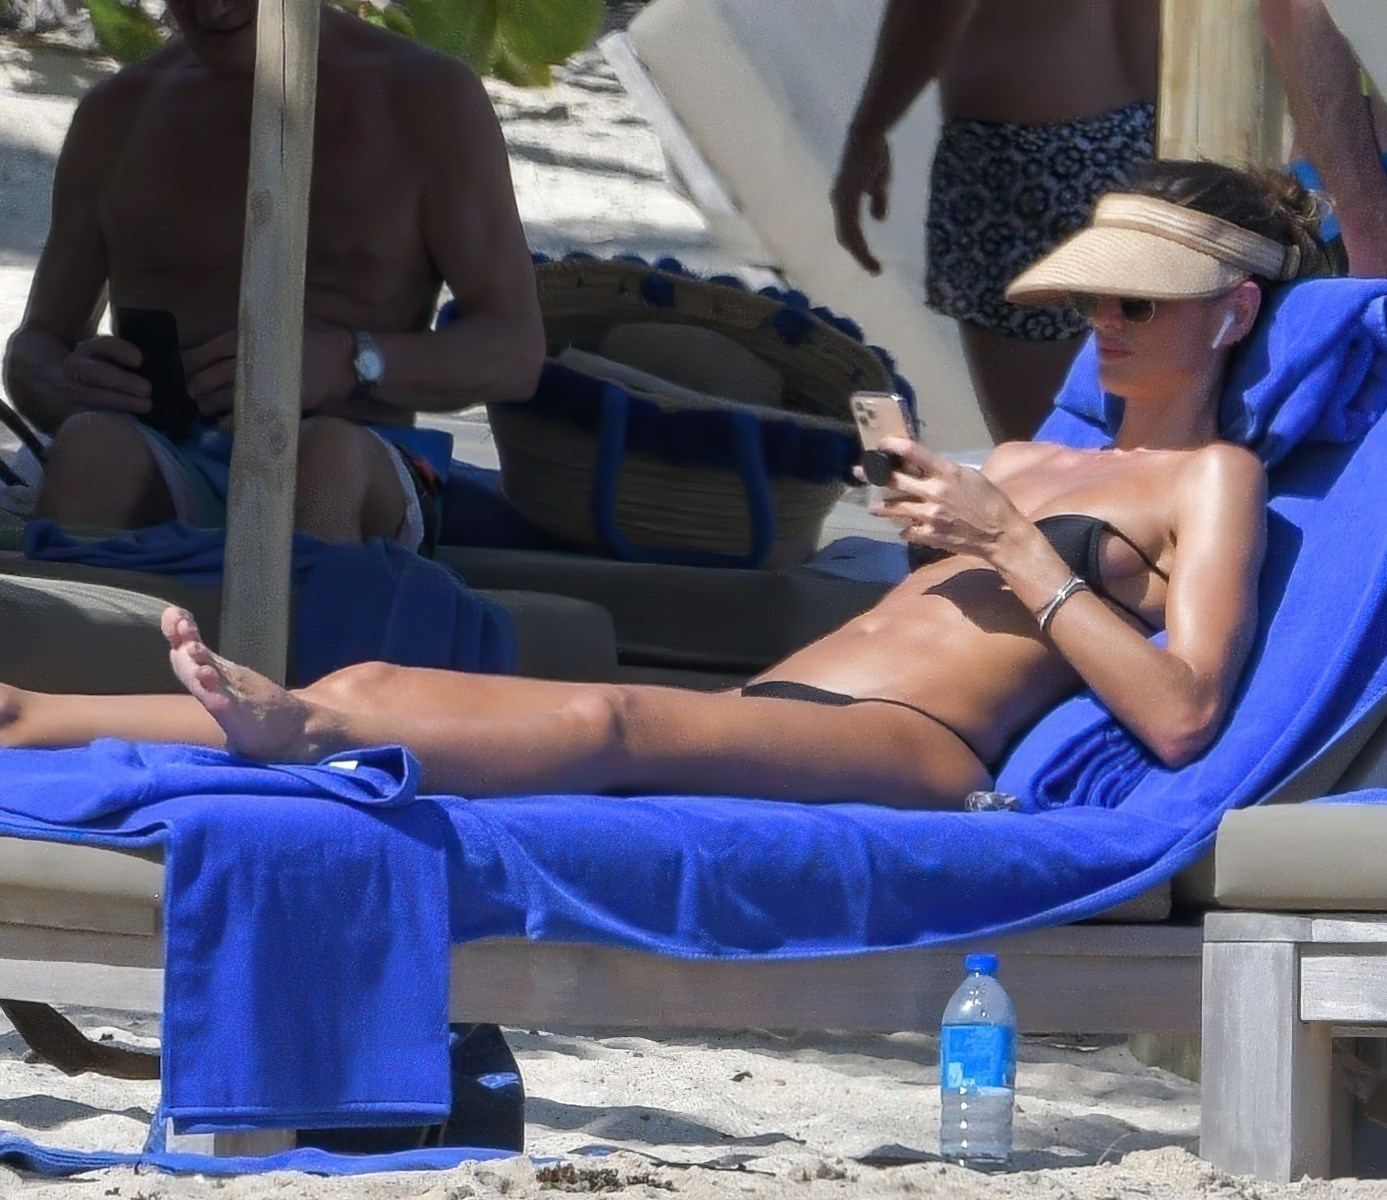 Izabel Goulart Candid Nude Vacation Photos